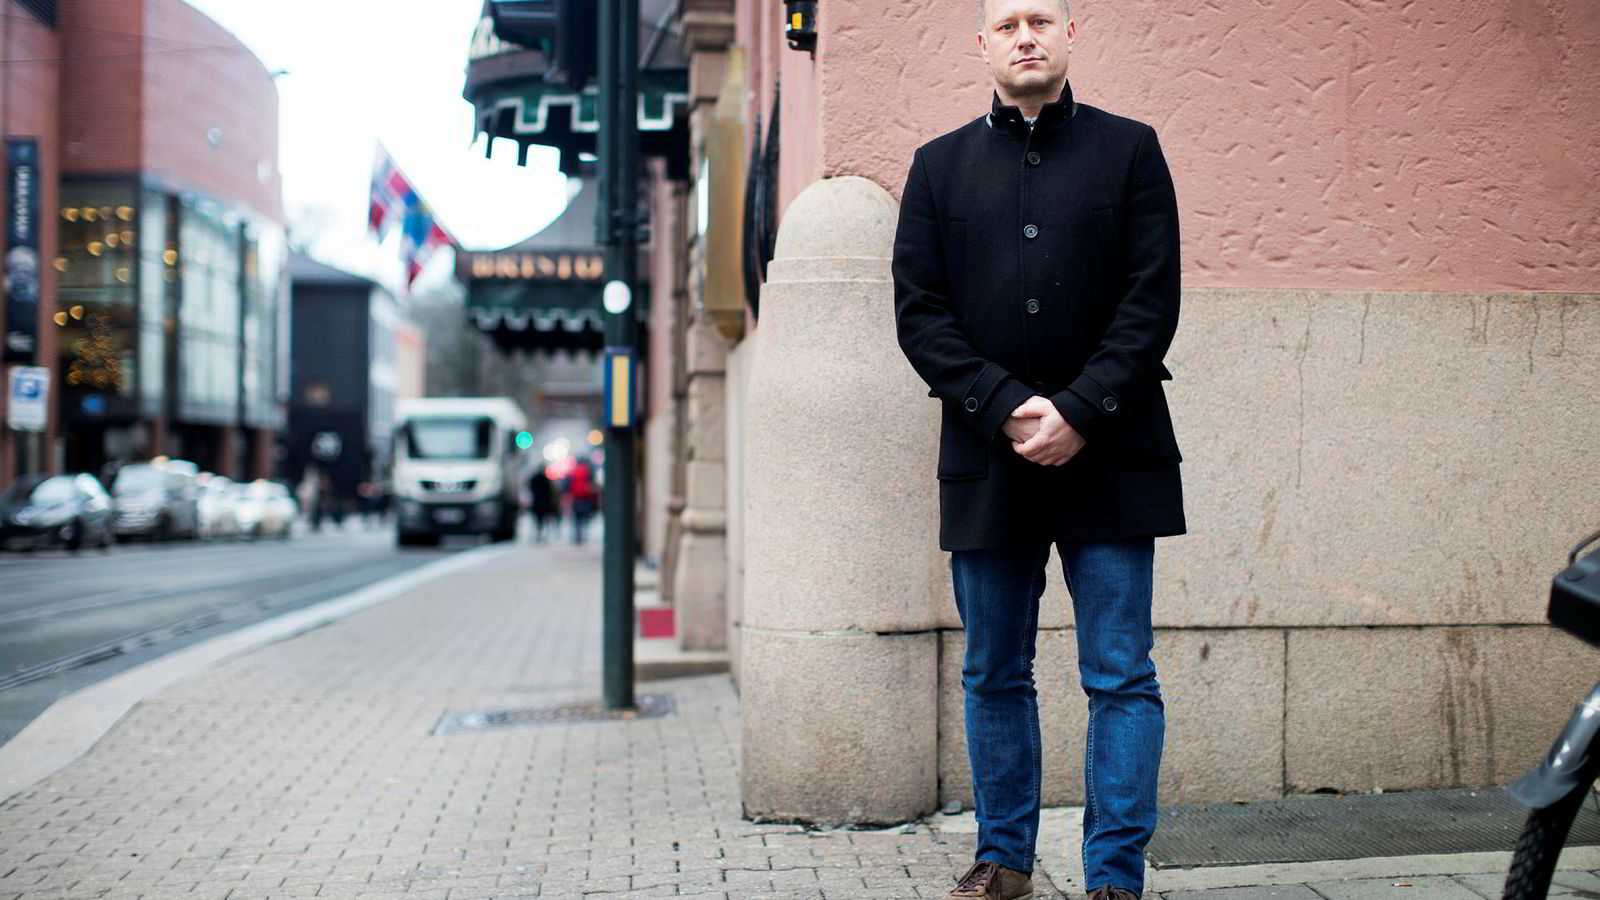 Administrerende direktør Alf Martin Johansen i Induct.